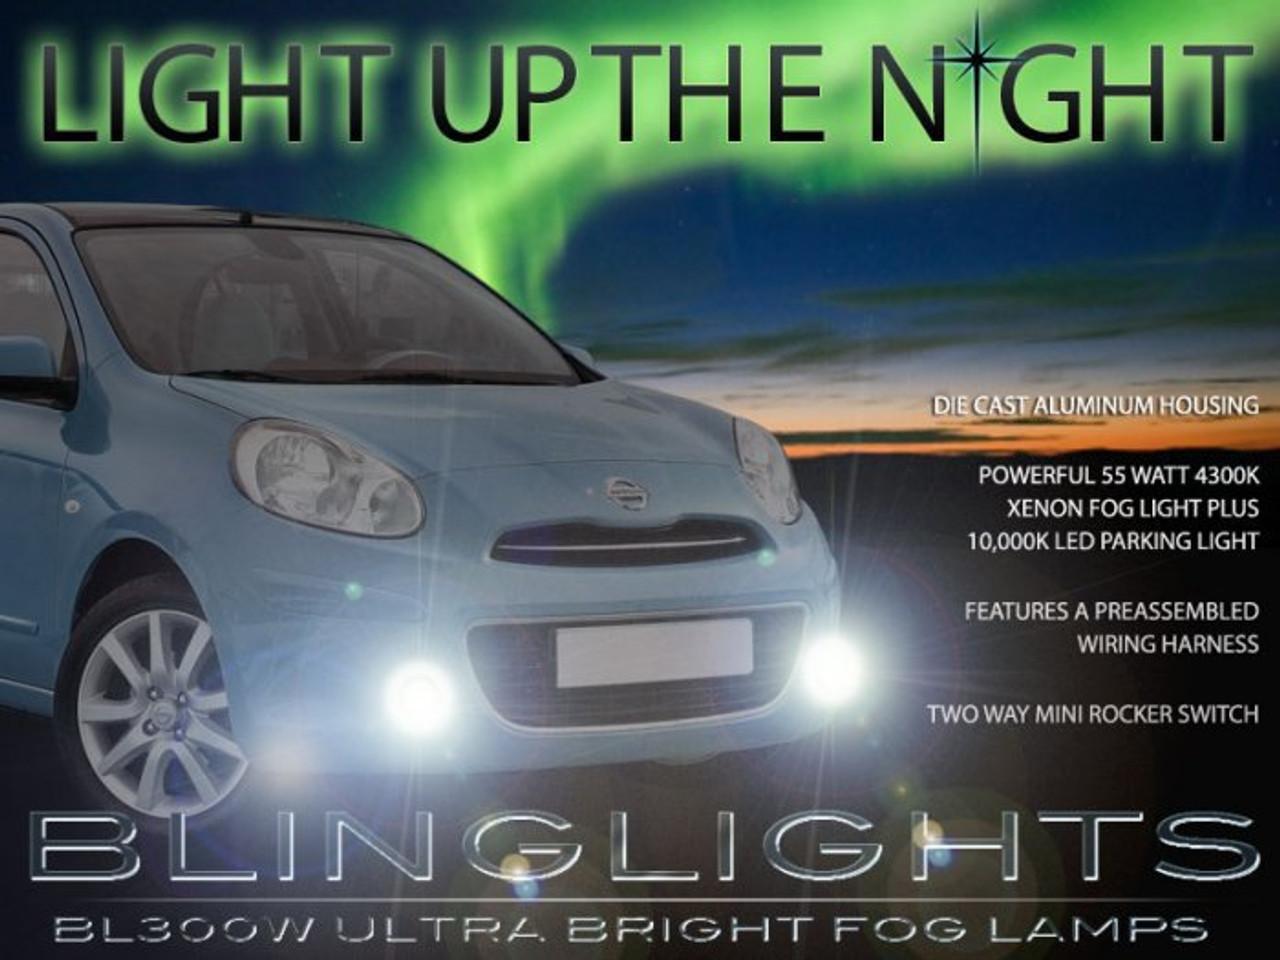 Fits Nissan Micra C+C K12 Blue 4-LED Xenon Bright Side Light Beam Bulbs